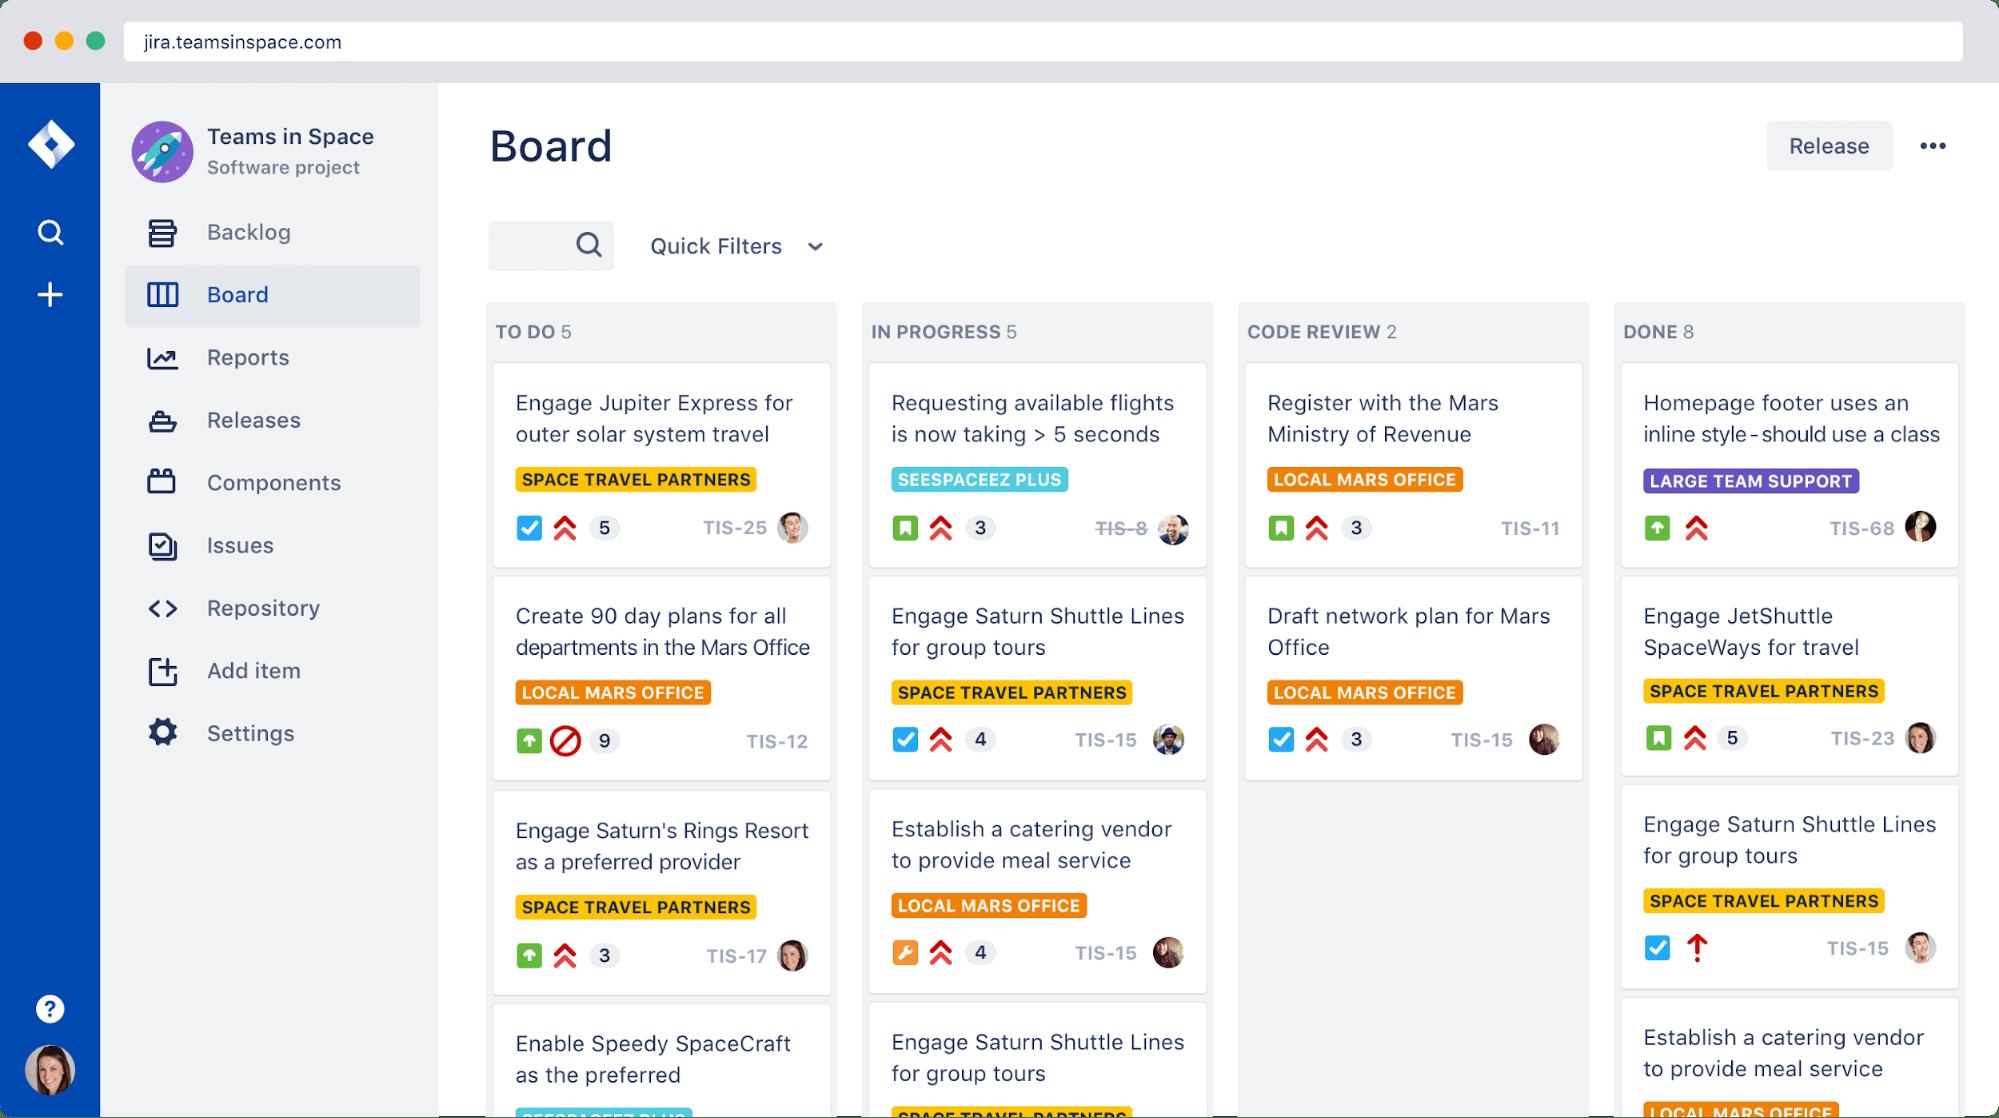 jira board view, from jira's website